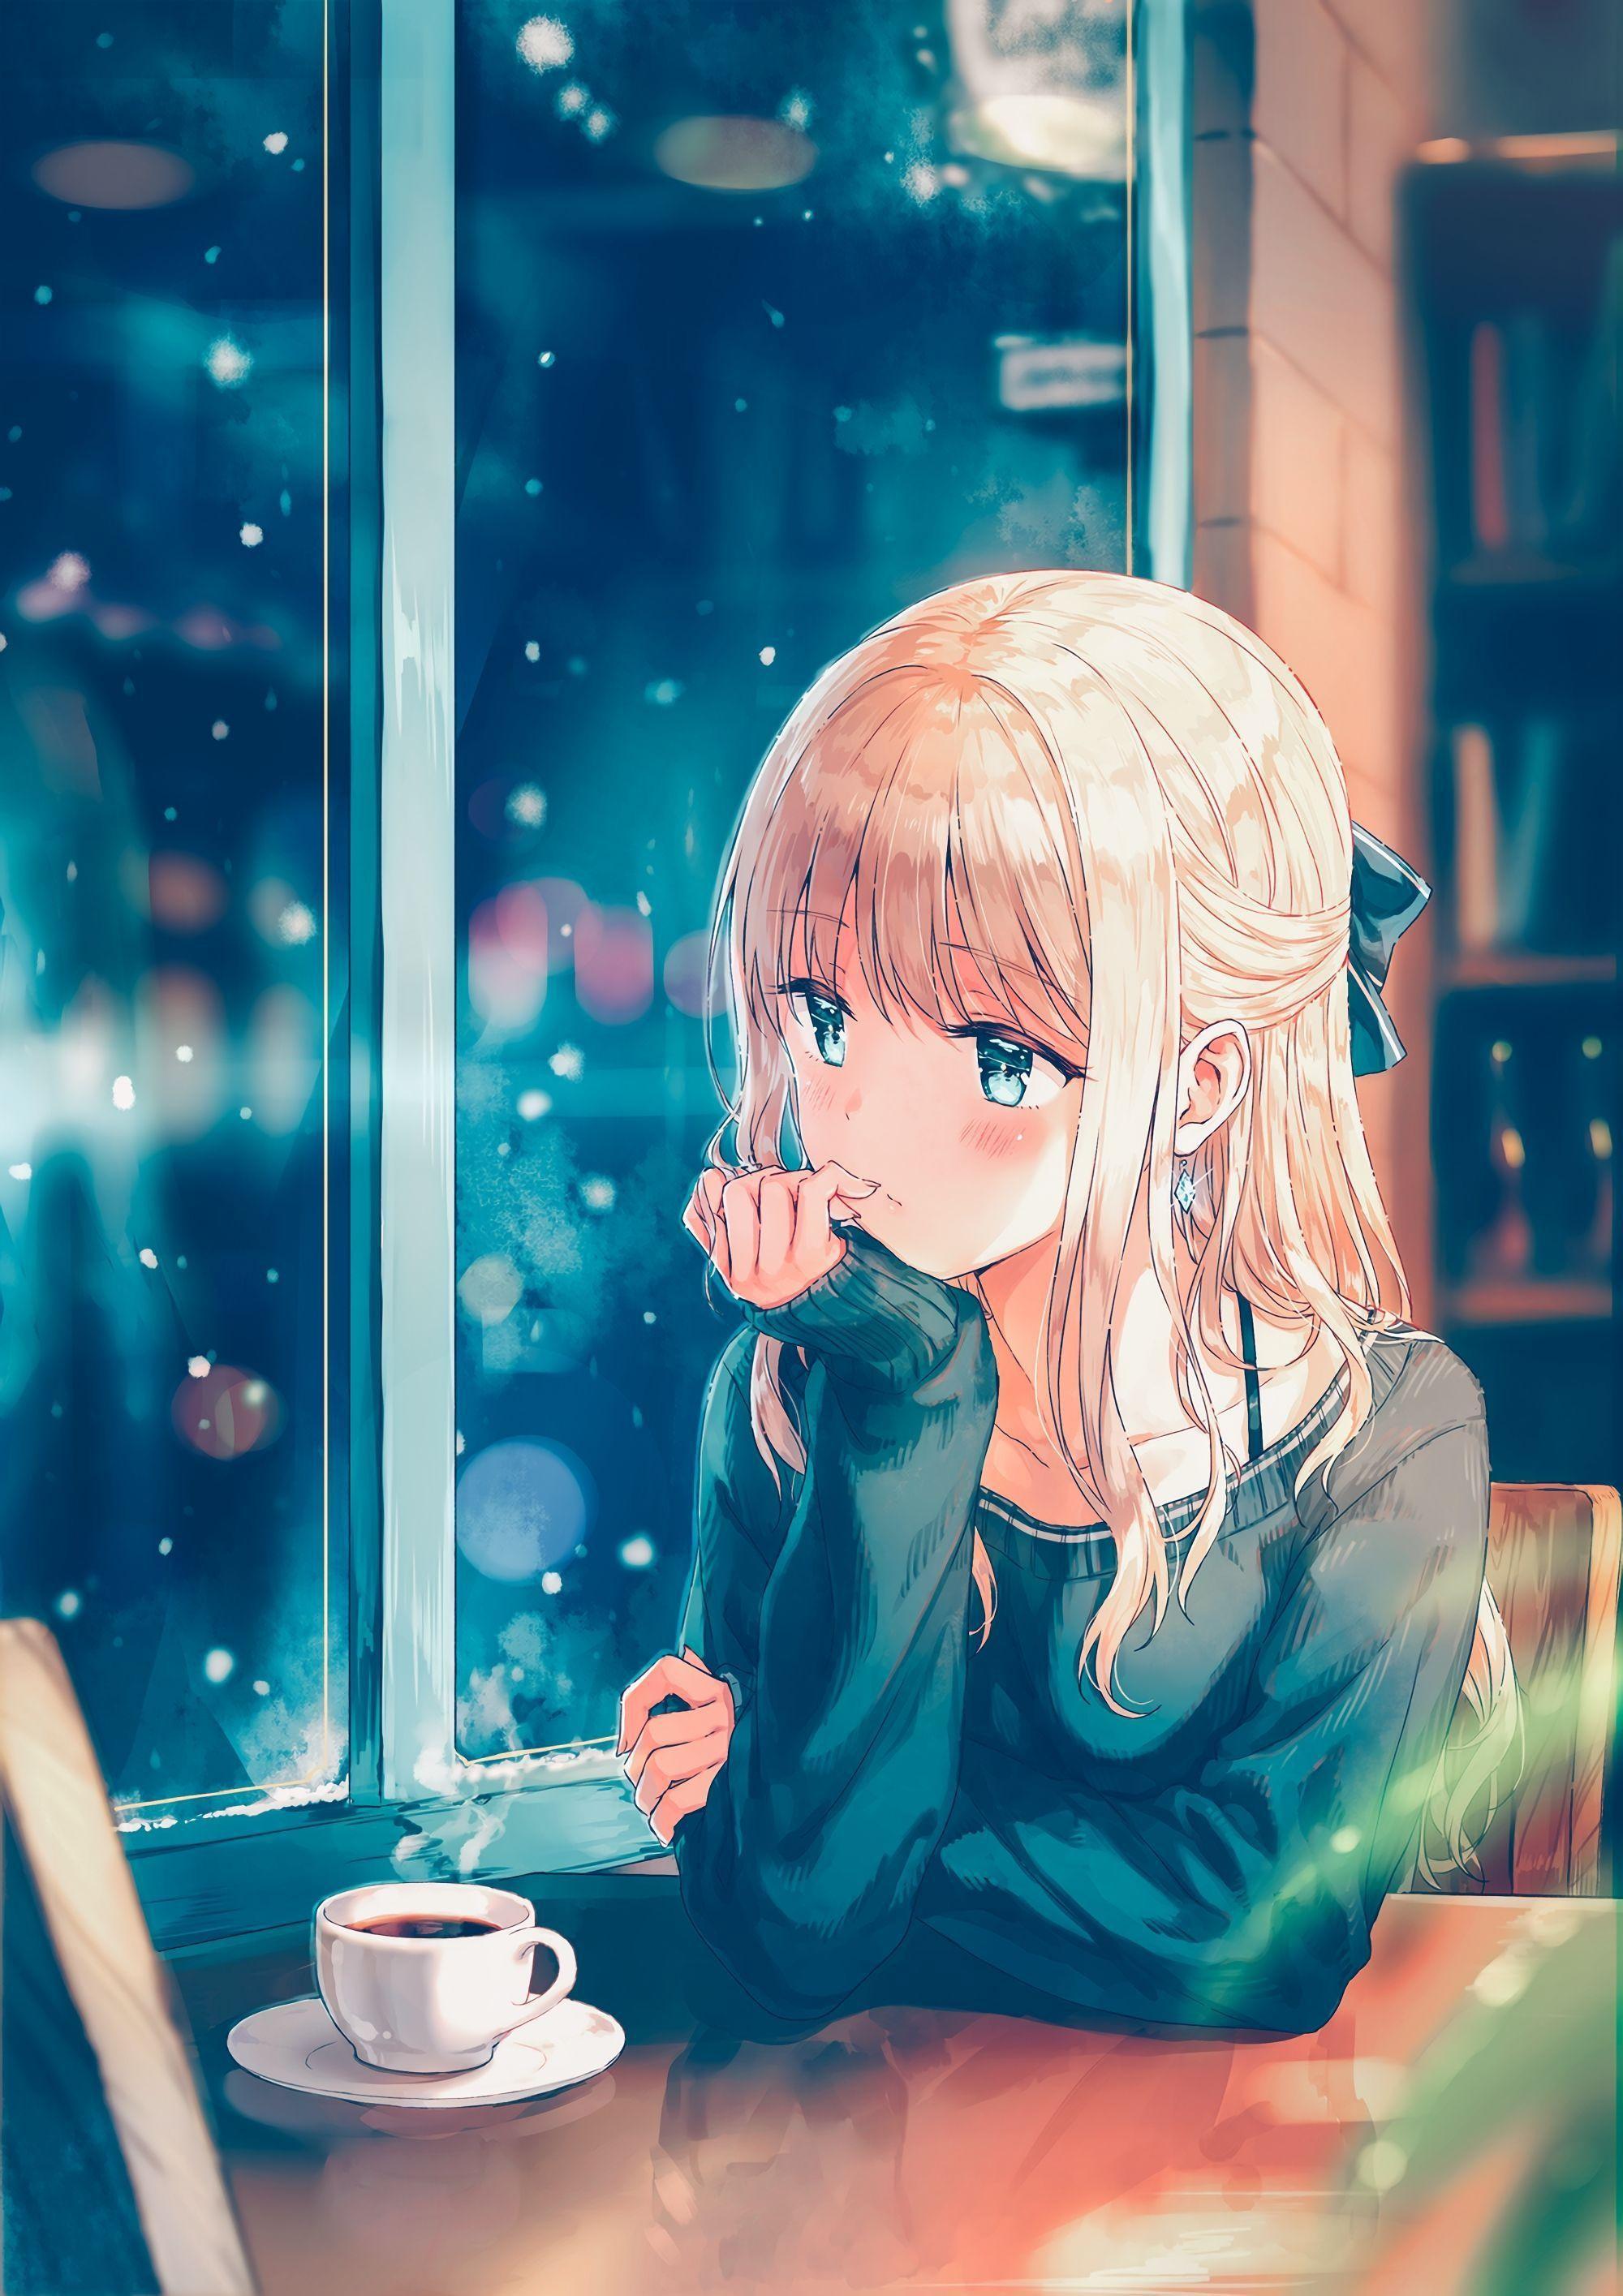 Cute Anime Phone Wallpapers Cute Anime Wallpaper Hd 2000x2830 Wallpaper Teahub Io